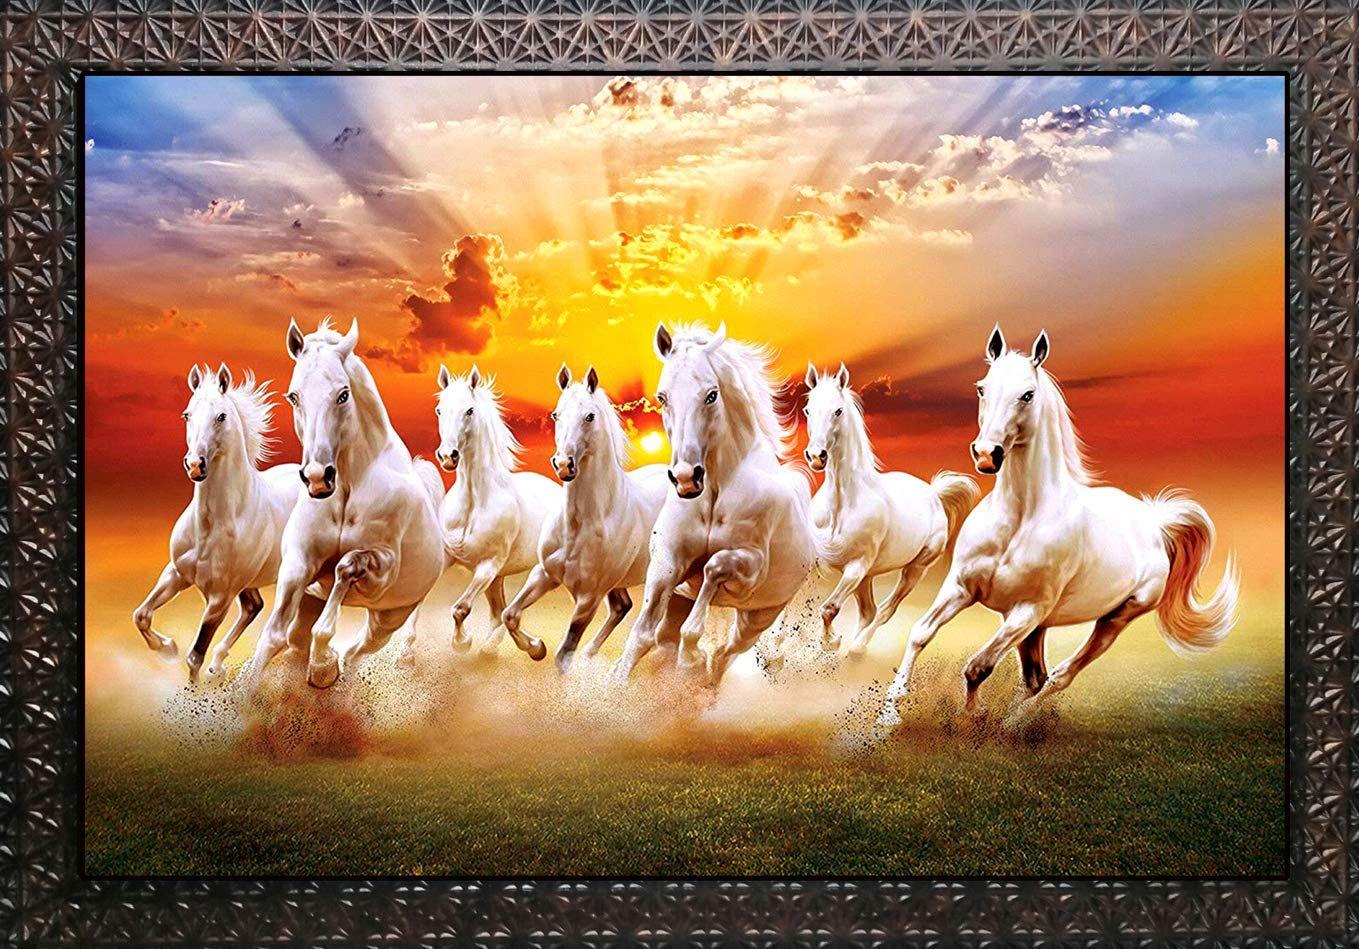 Pari Arts Beautiful Wall Painting Vastu Running Horses Art Special Effects Sparkle Laminati In 2021 White Horse Painting Seven Horses Painting Horse Canvas Painting